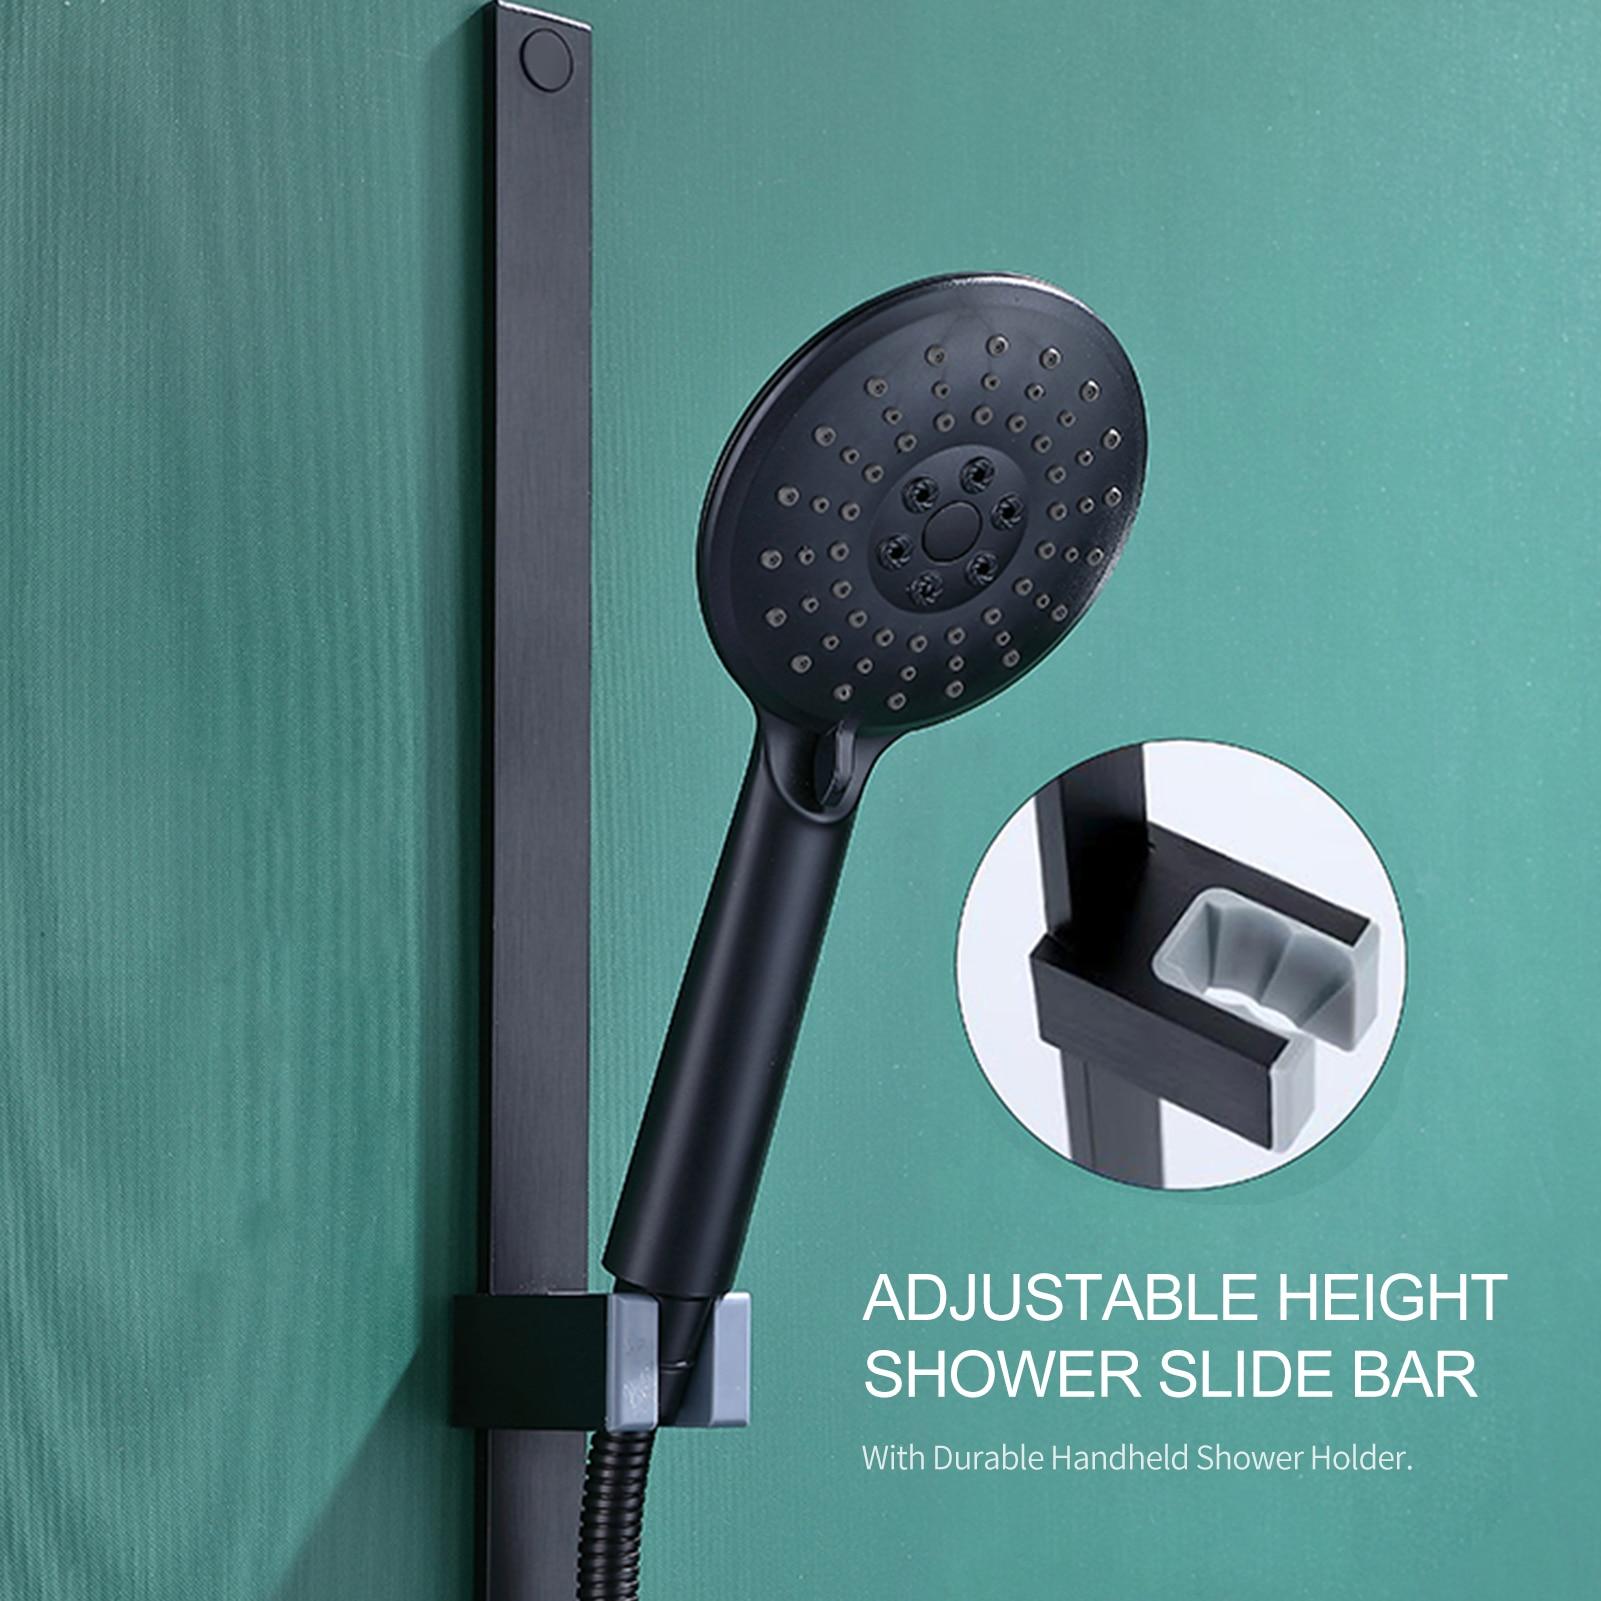 Sliding-Bar Shower-Bar Black Wall-Mounted Nail-Free Adjustable Minimalist-Style High-Quality